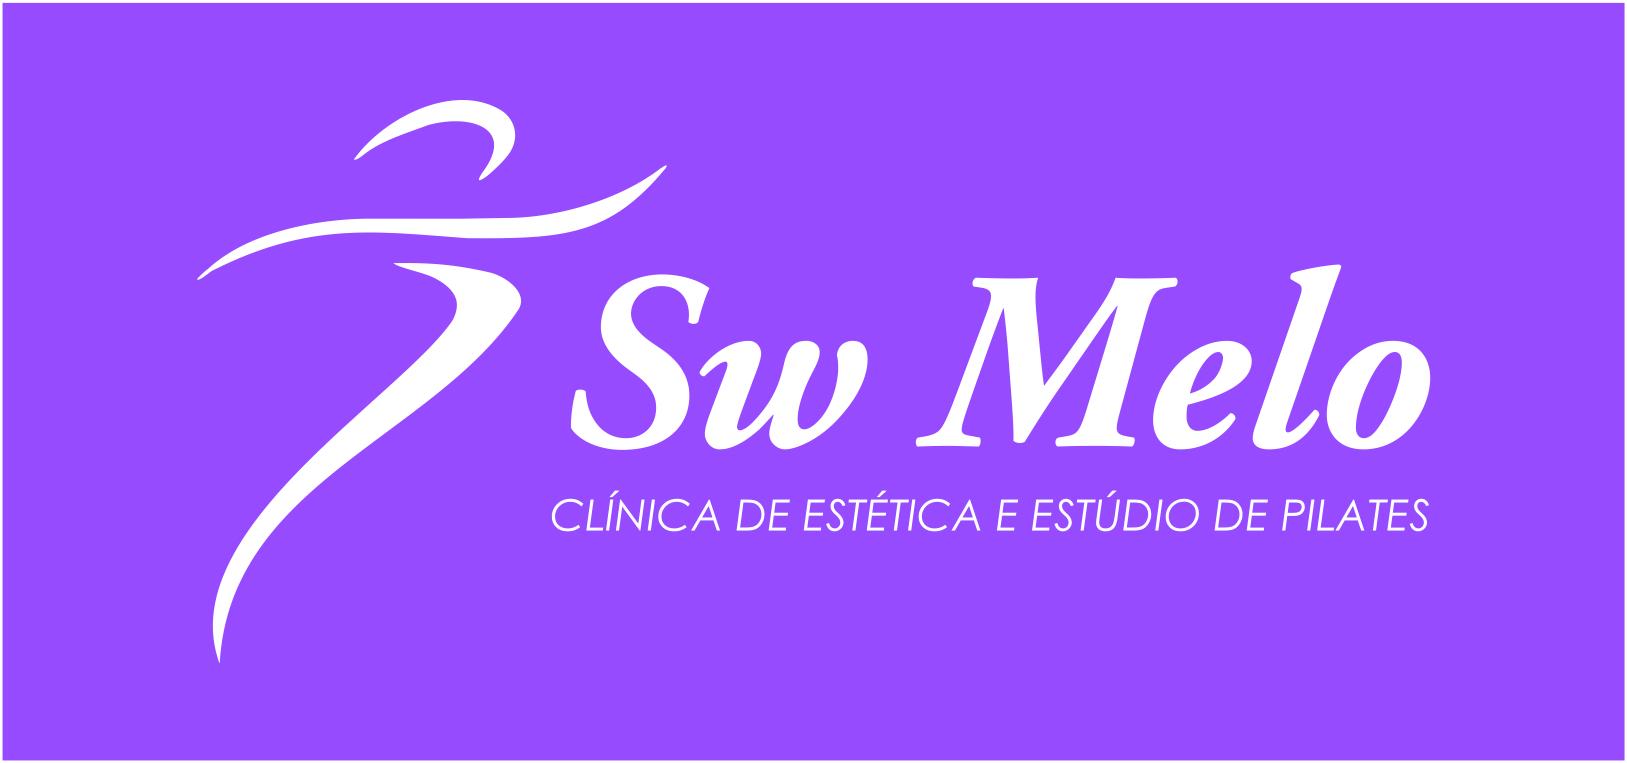 SW Melo